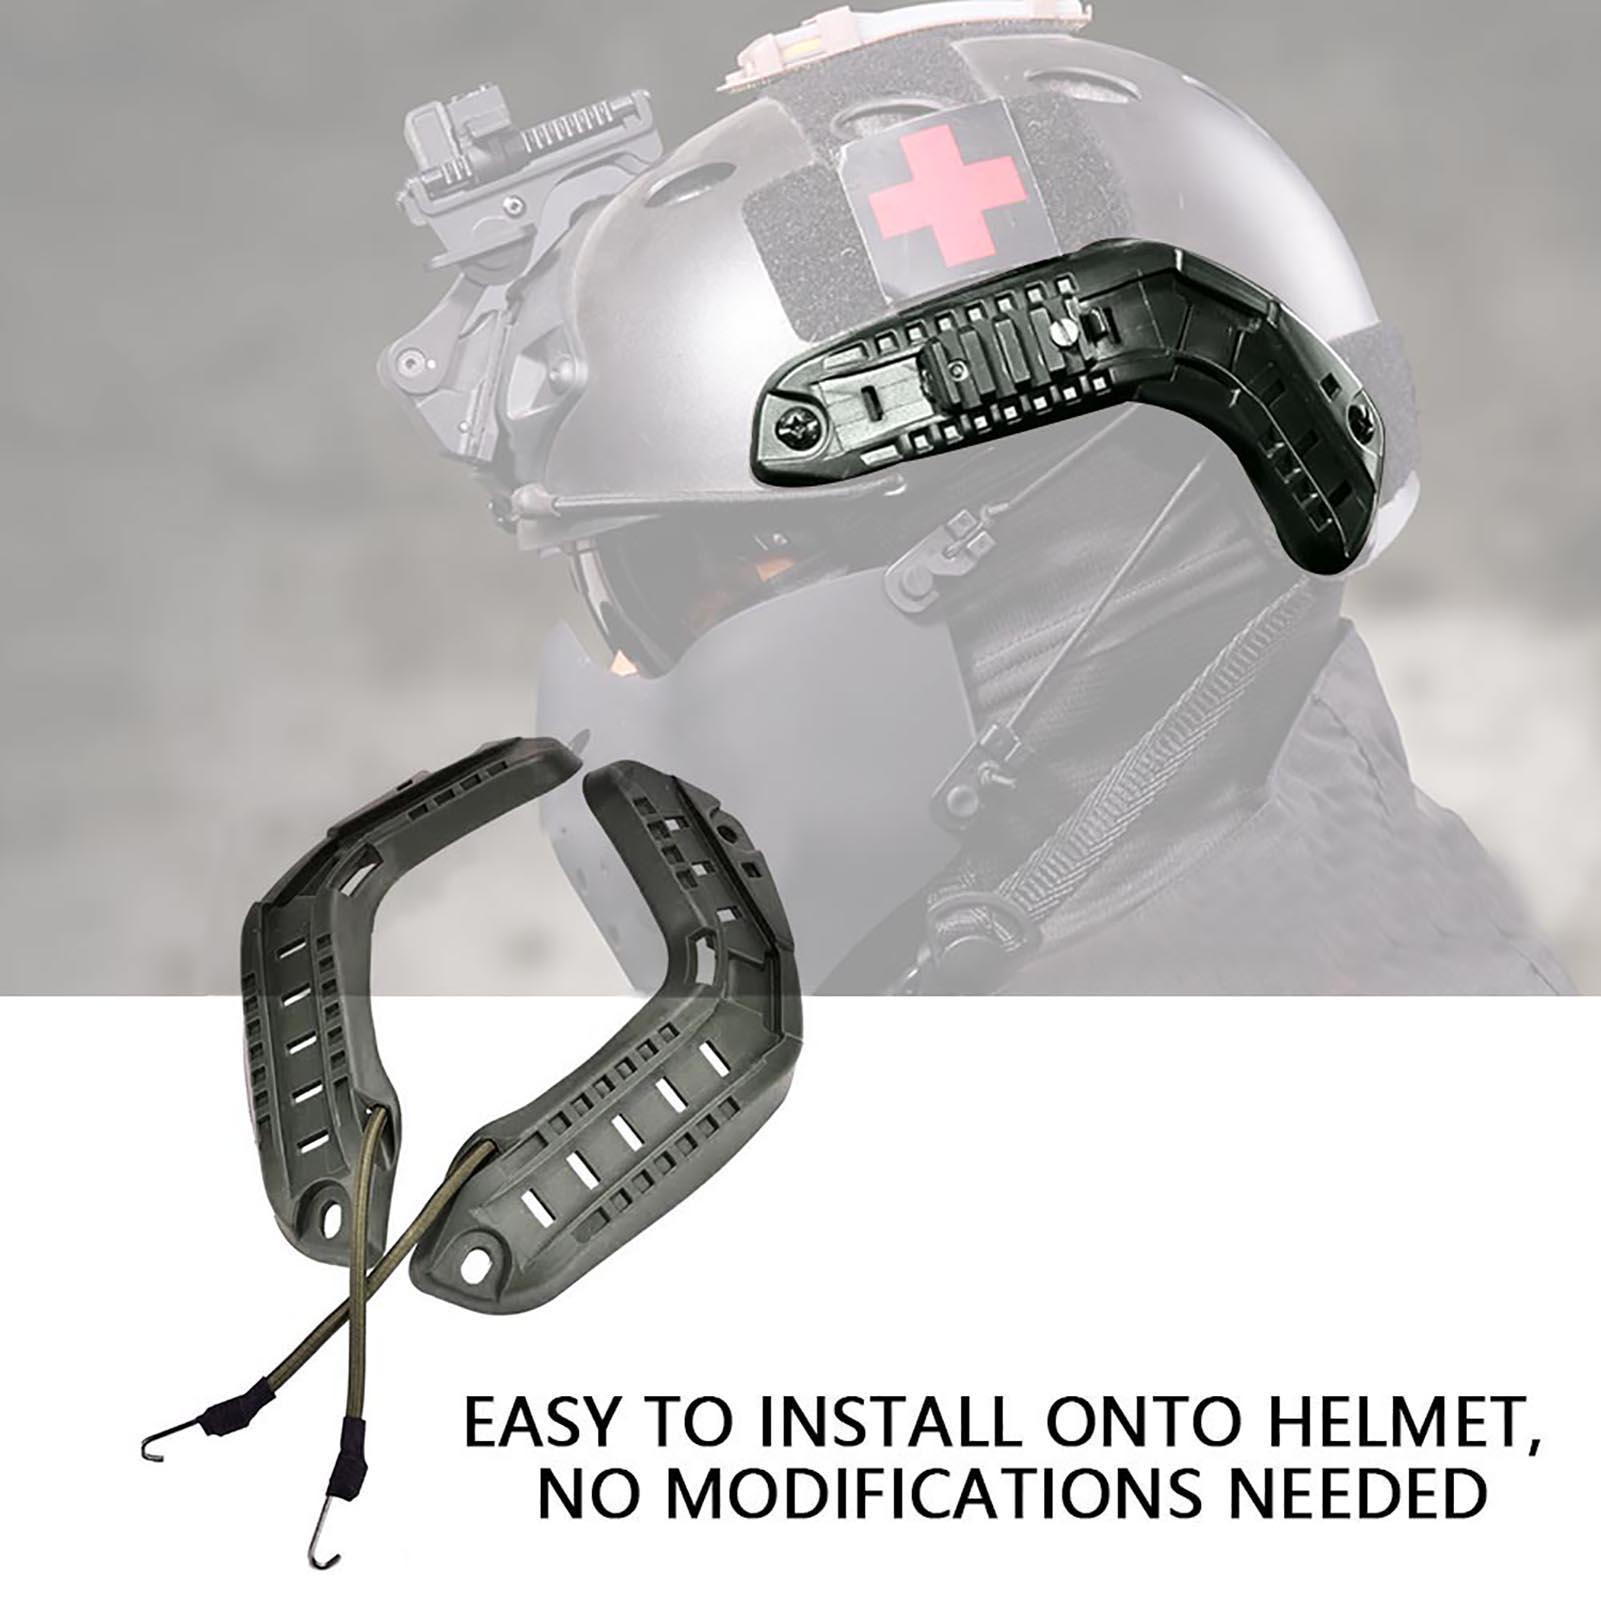 1Pair-Helmet-Side-Rails-for-Flashlight-Camera-Attachments-W-Mounting-Screws-Kit thumbnail 18